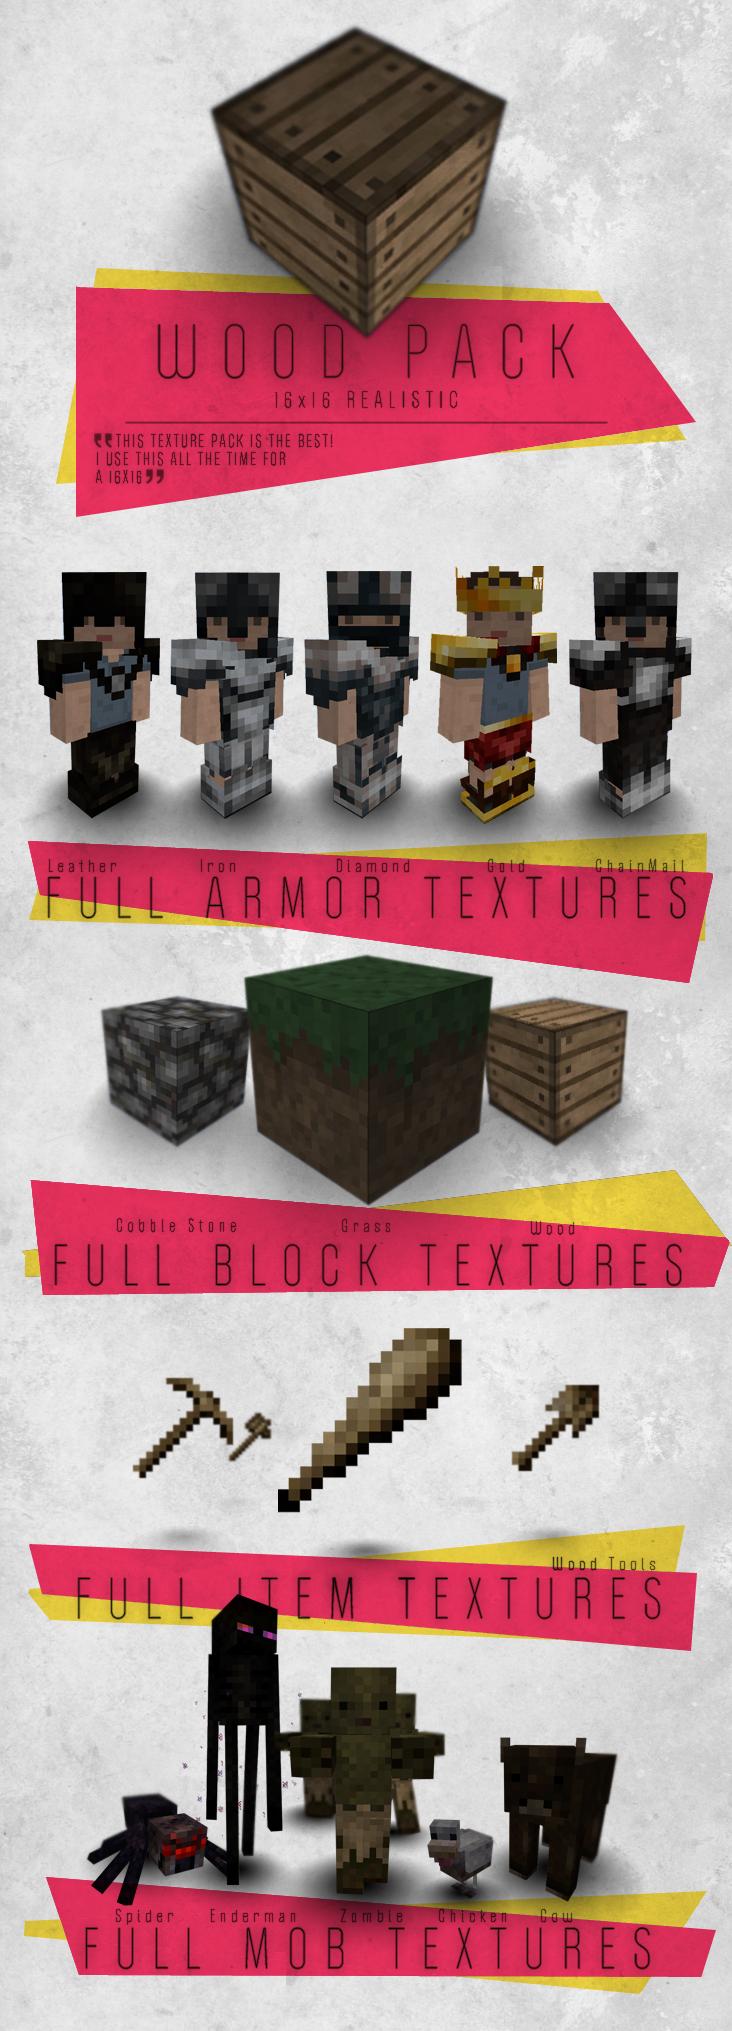 http://img.9minecraft.net/TexturePack2/Wood-texture-pack.png